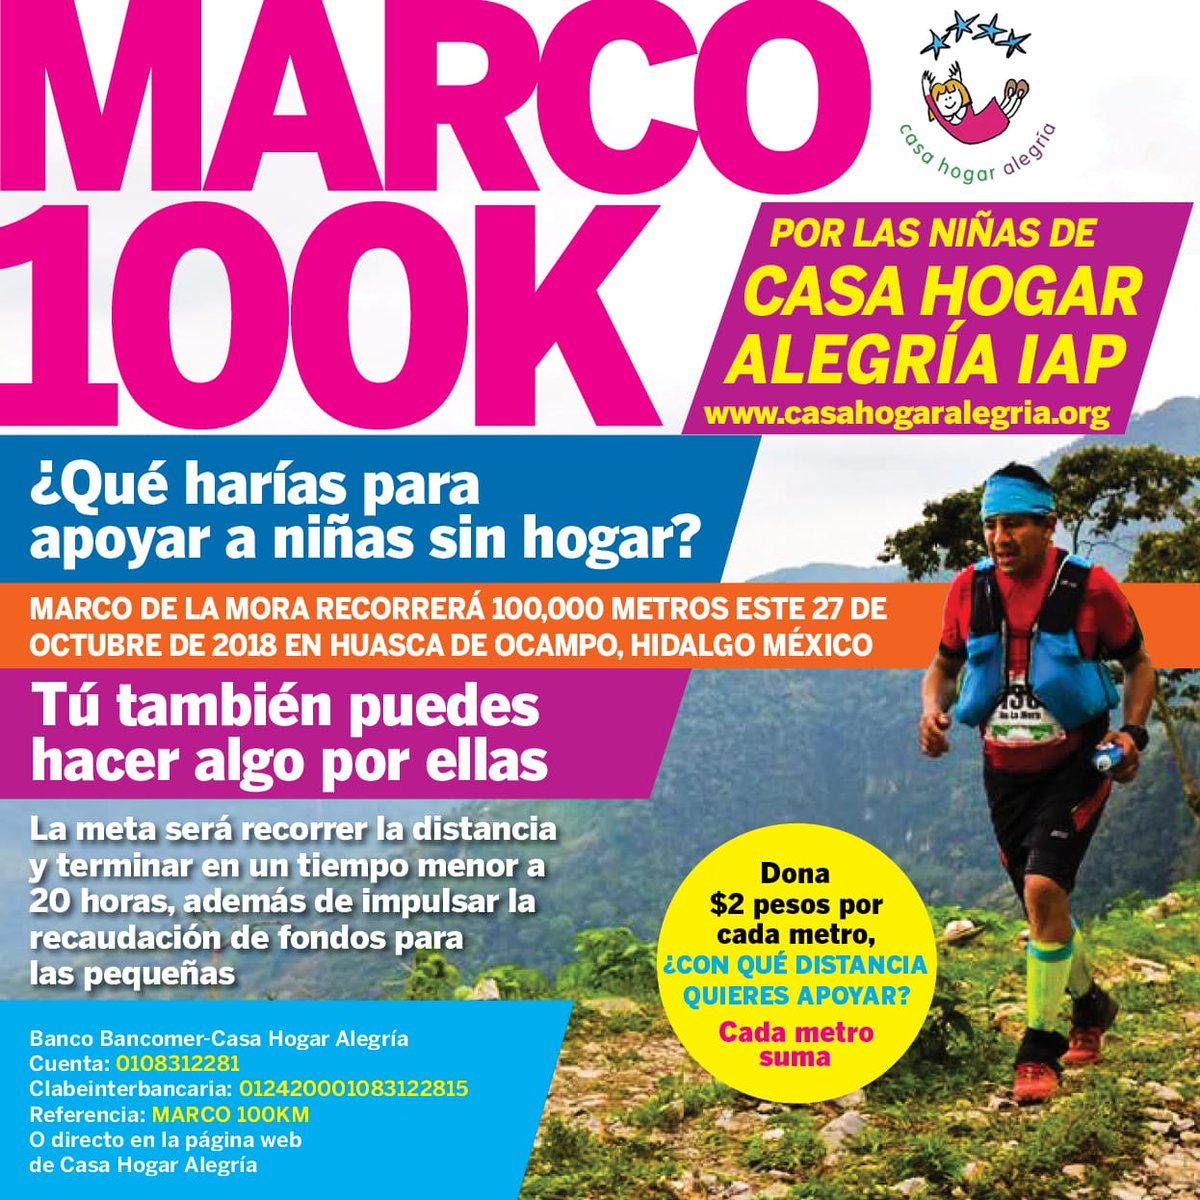 Casa Hogar Alegría (@CsaHgrAlegria) | Twitter